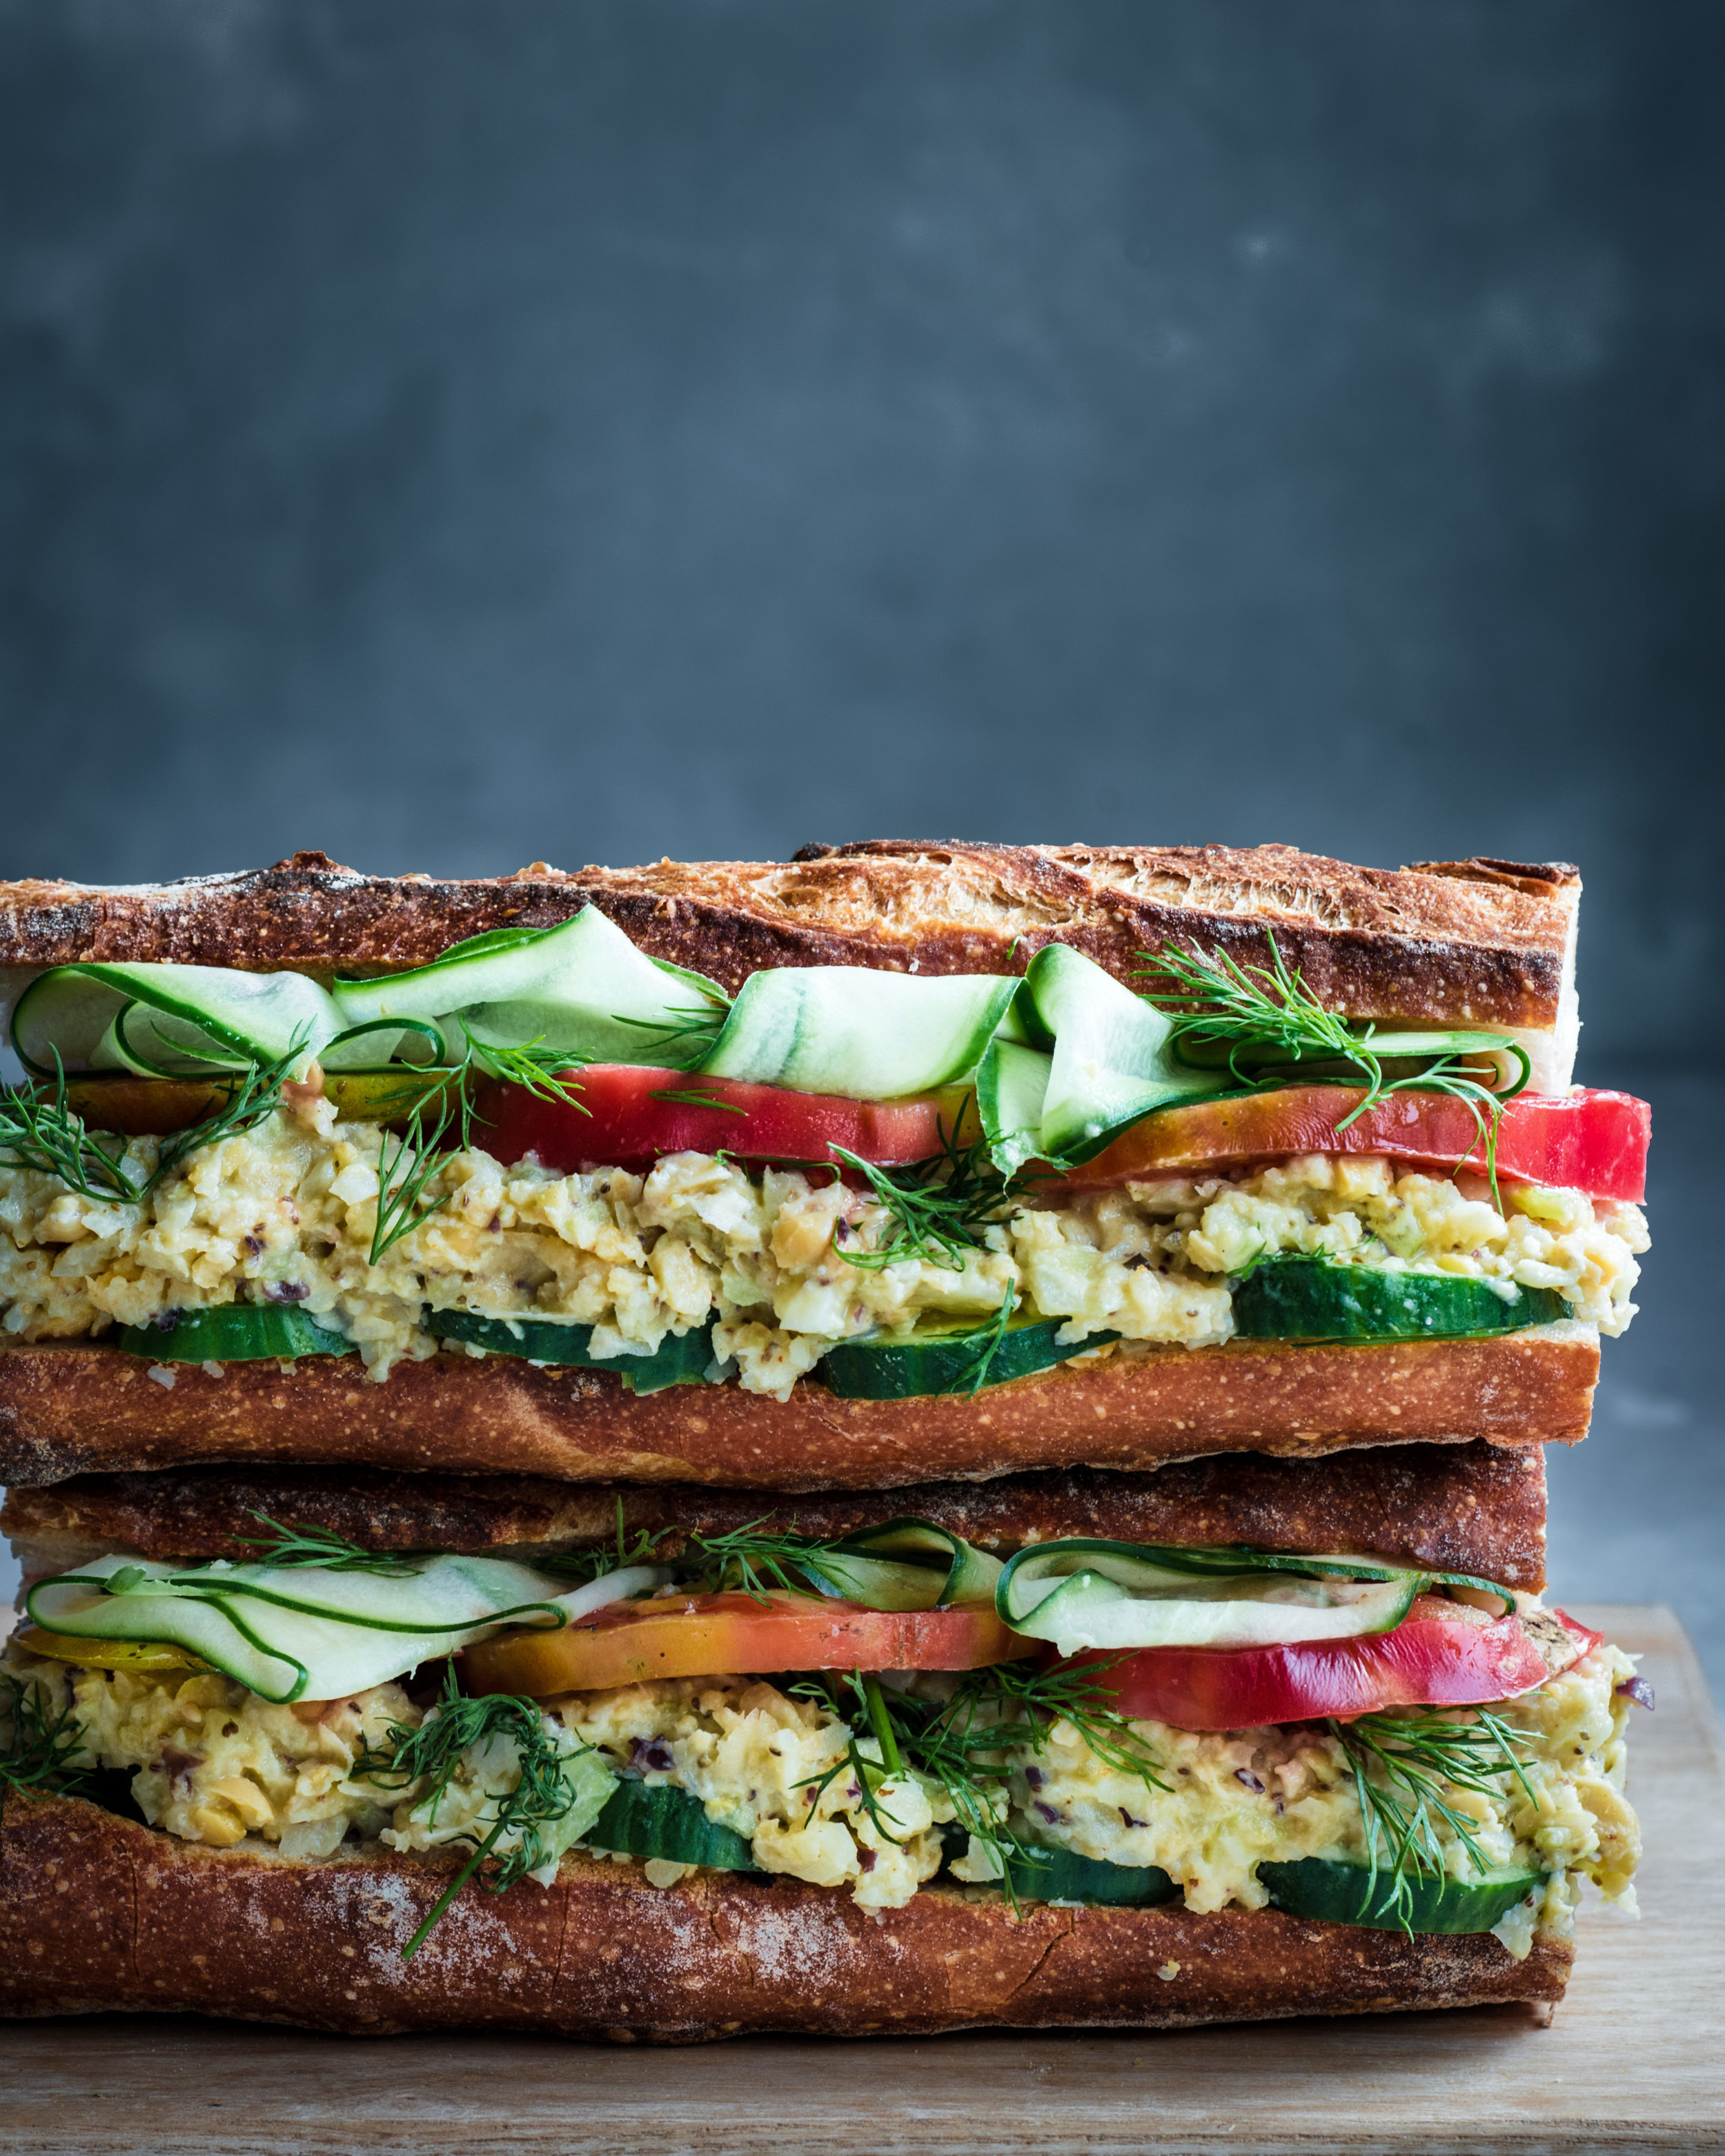 Vegan Tuna Salad Sandwich. Vegan Chickpea Tuna Salad Sandwich.